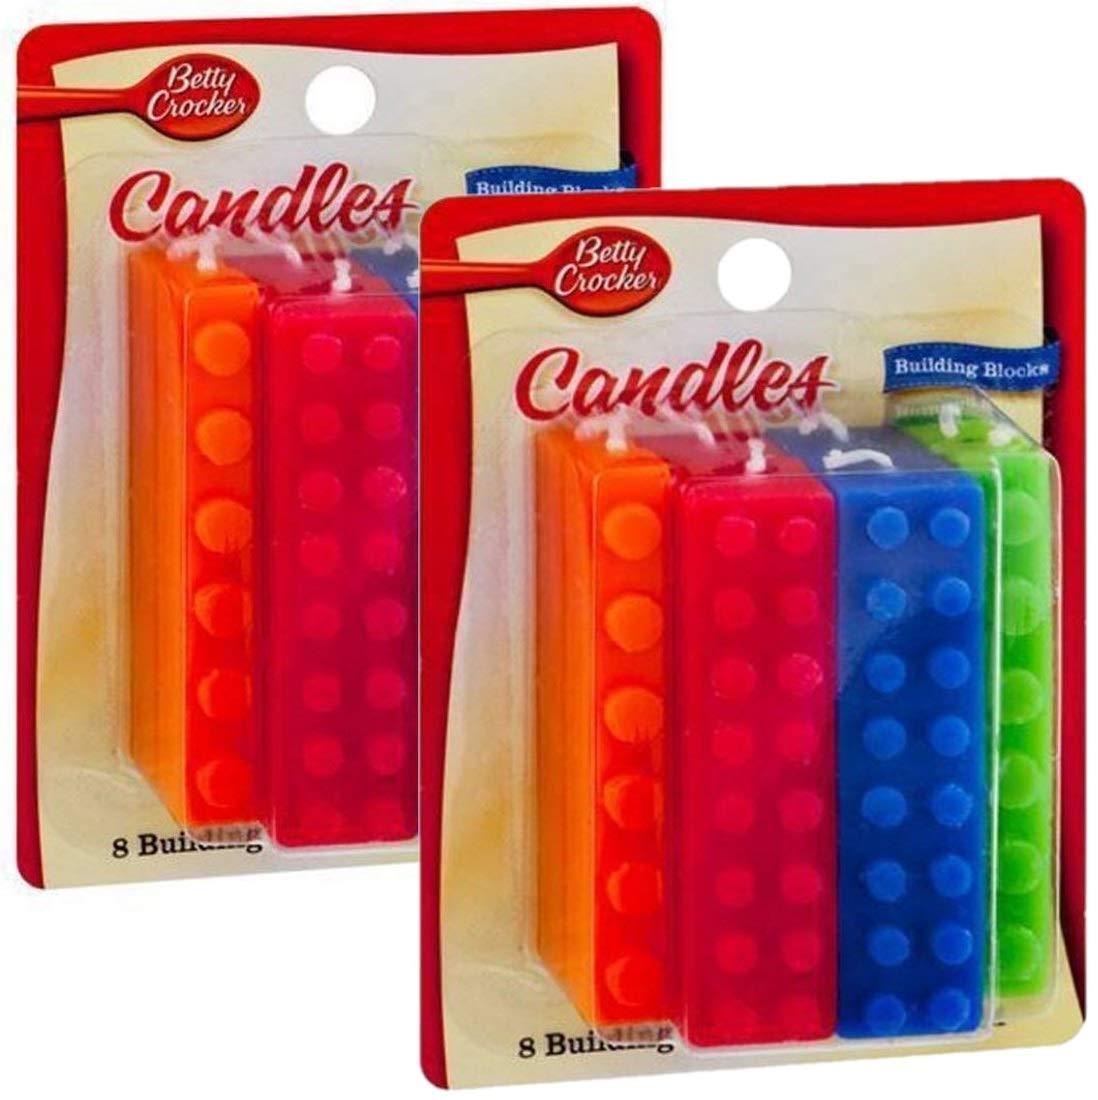 Betty Crocker Building Block Candles (Pack of 2)